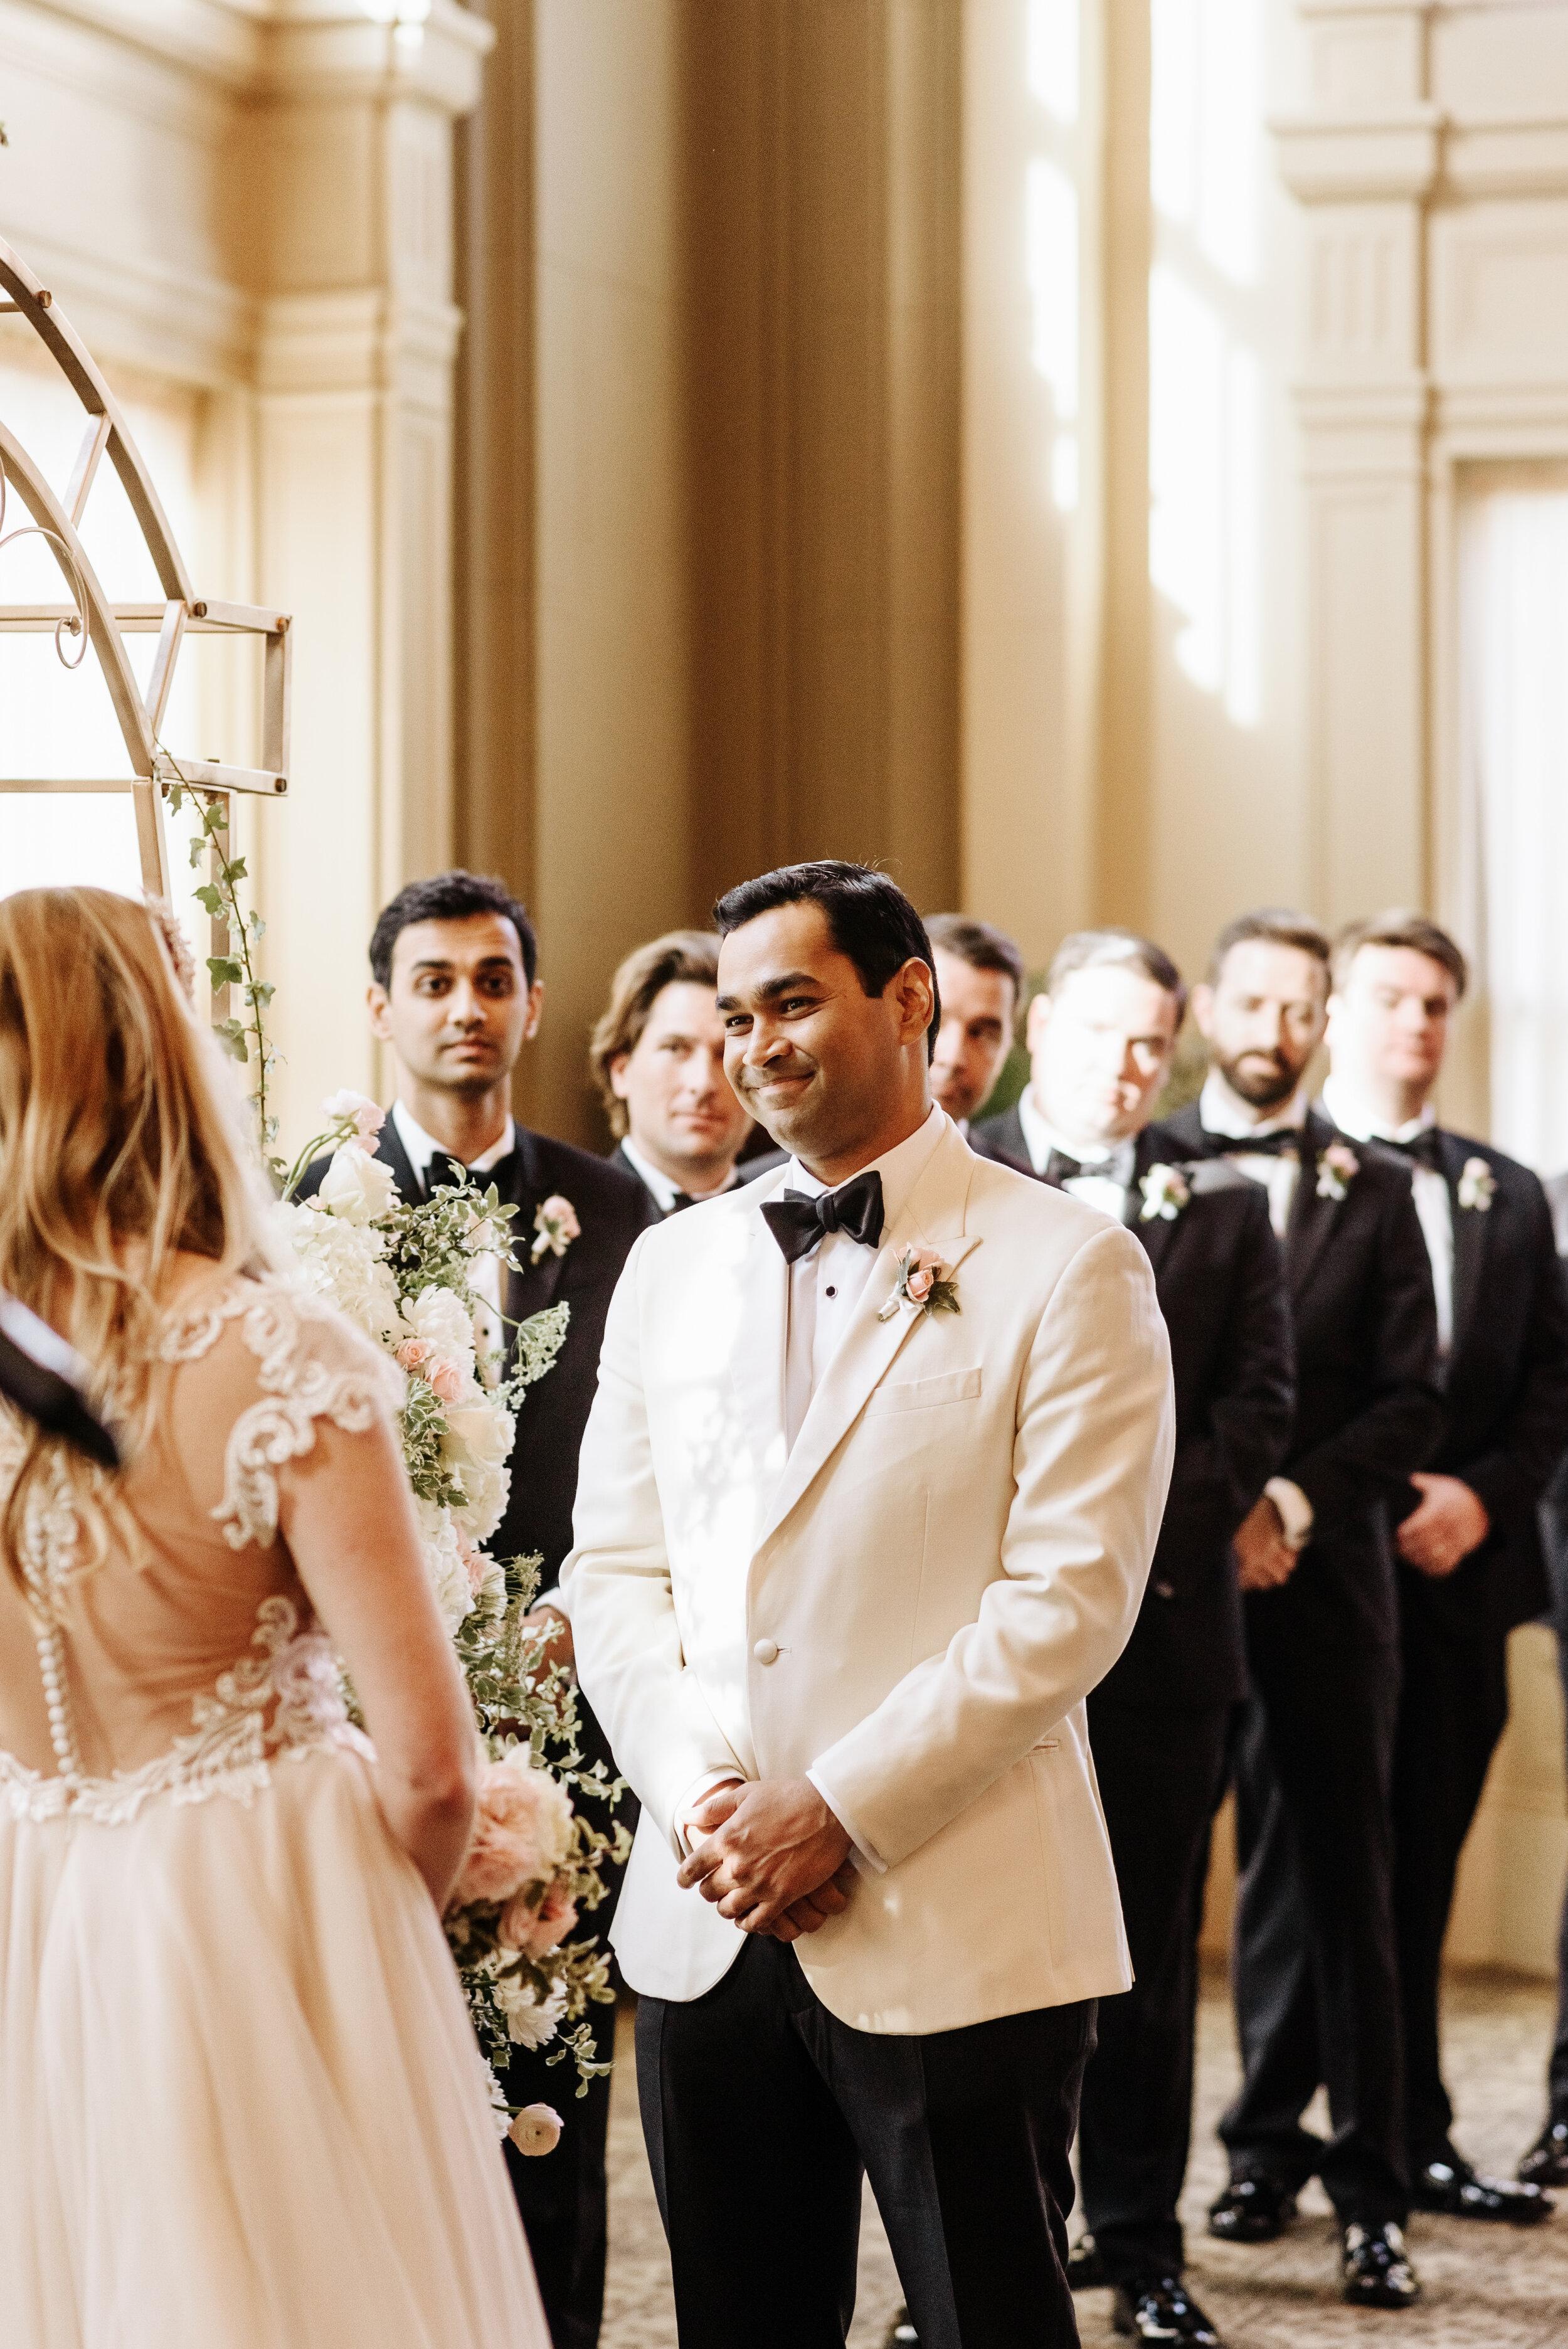 Cassie-Mrunal-Wedding-Quirk-Hotel-John-Marshall-Ballrooms-Richmond-Virginia-Photography-by-V-76.jpg